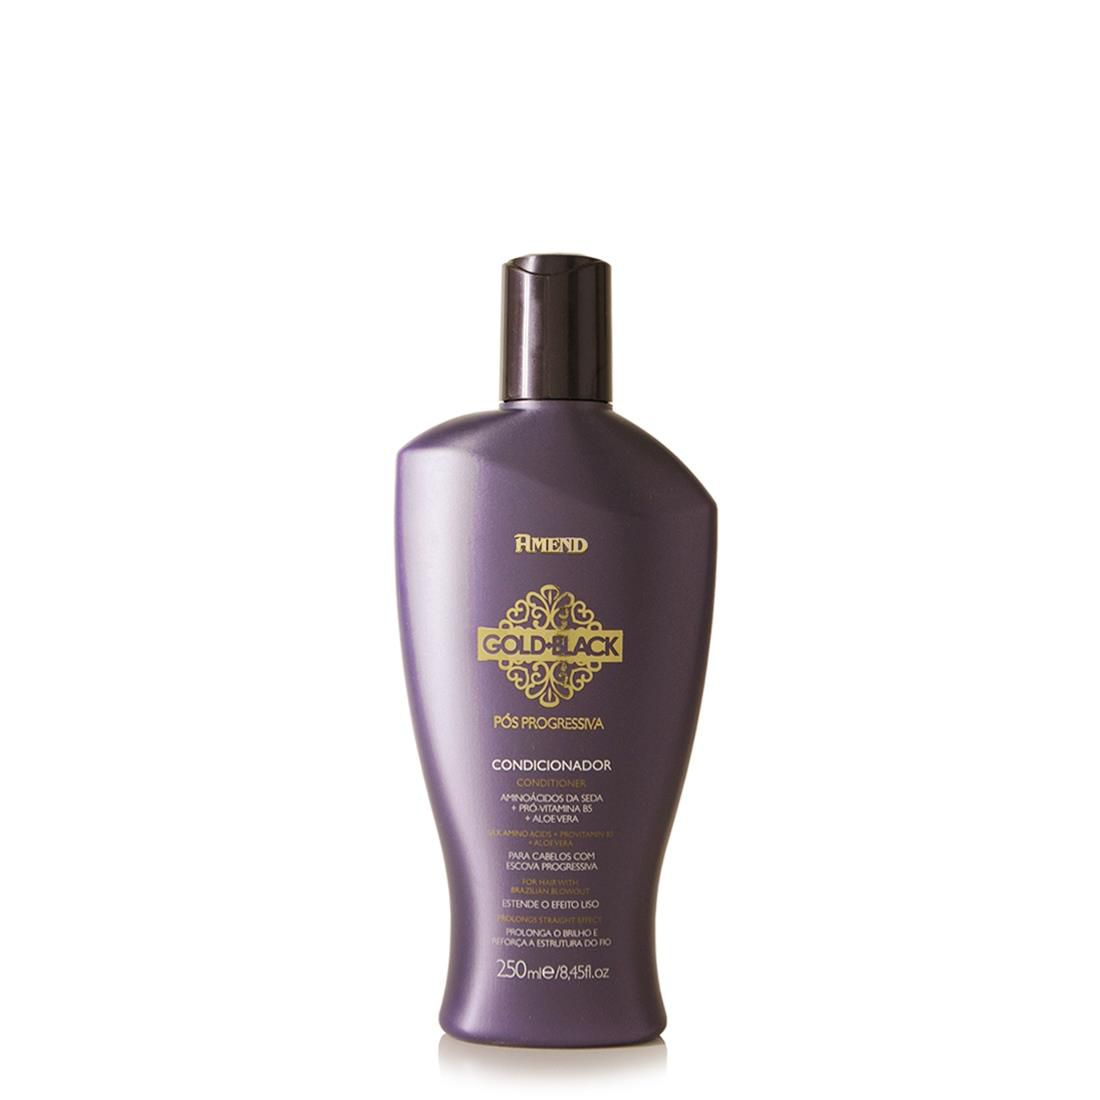 Amend Shampoo Gold Black Pós Progressiva 250mL